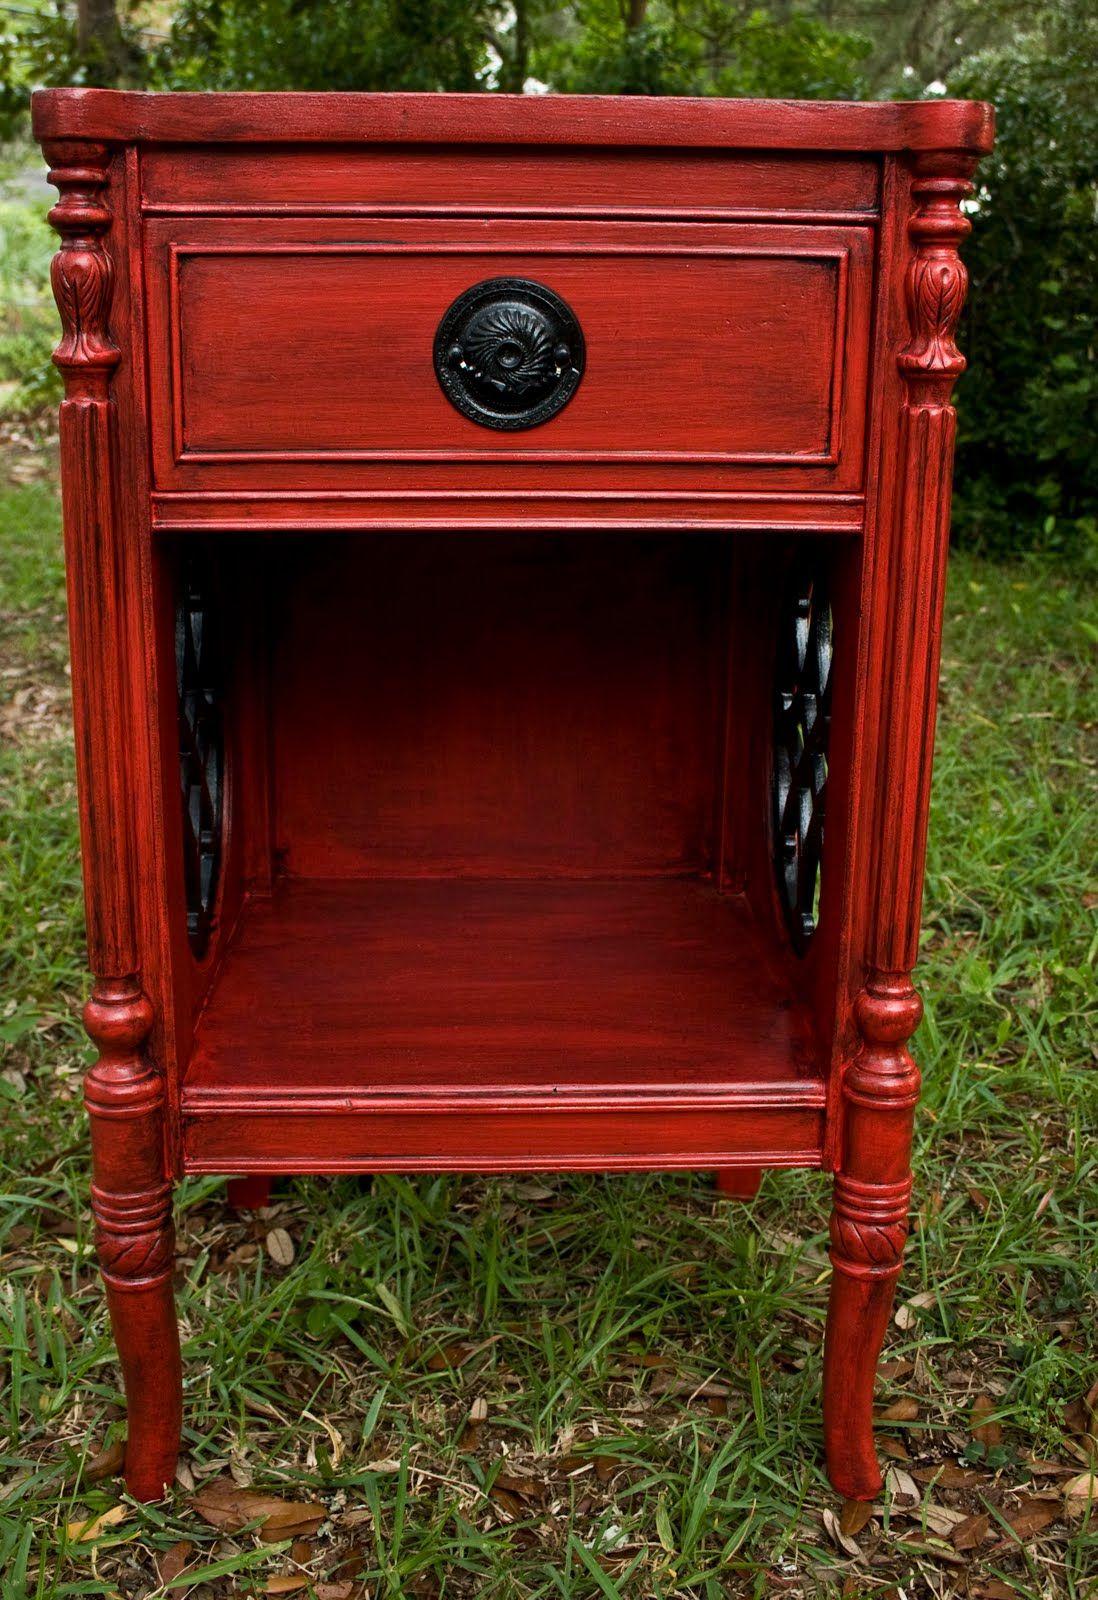 image detail for shabby chic furniture red and black glazed rh pinterest com